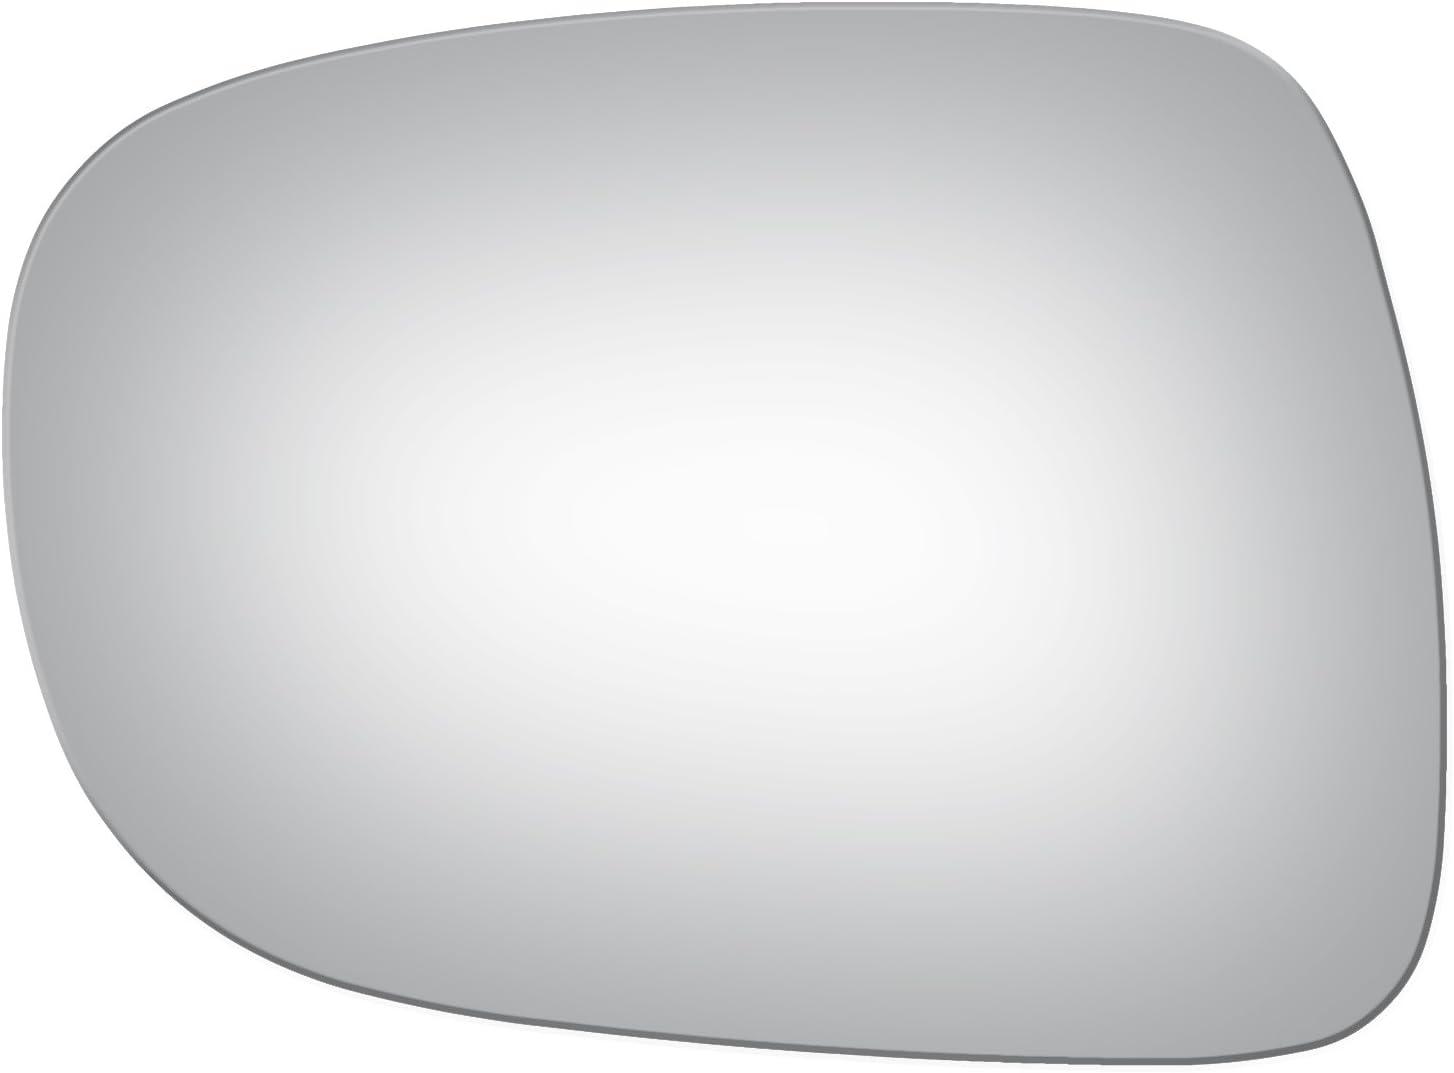 LEX-IS 250 2005 to 2012 Silver Wide AngLEX Driver Side Door Mirror Glass RH